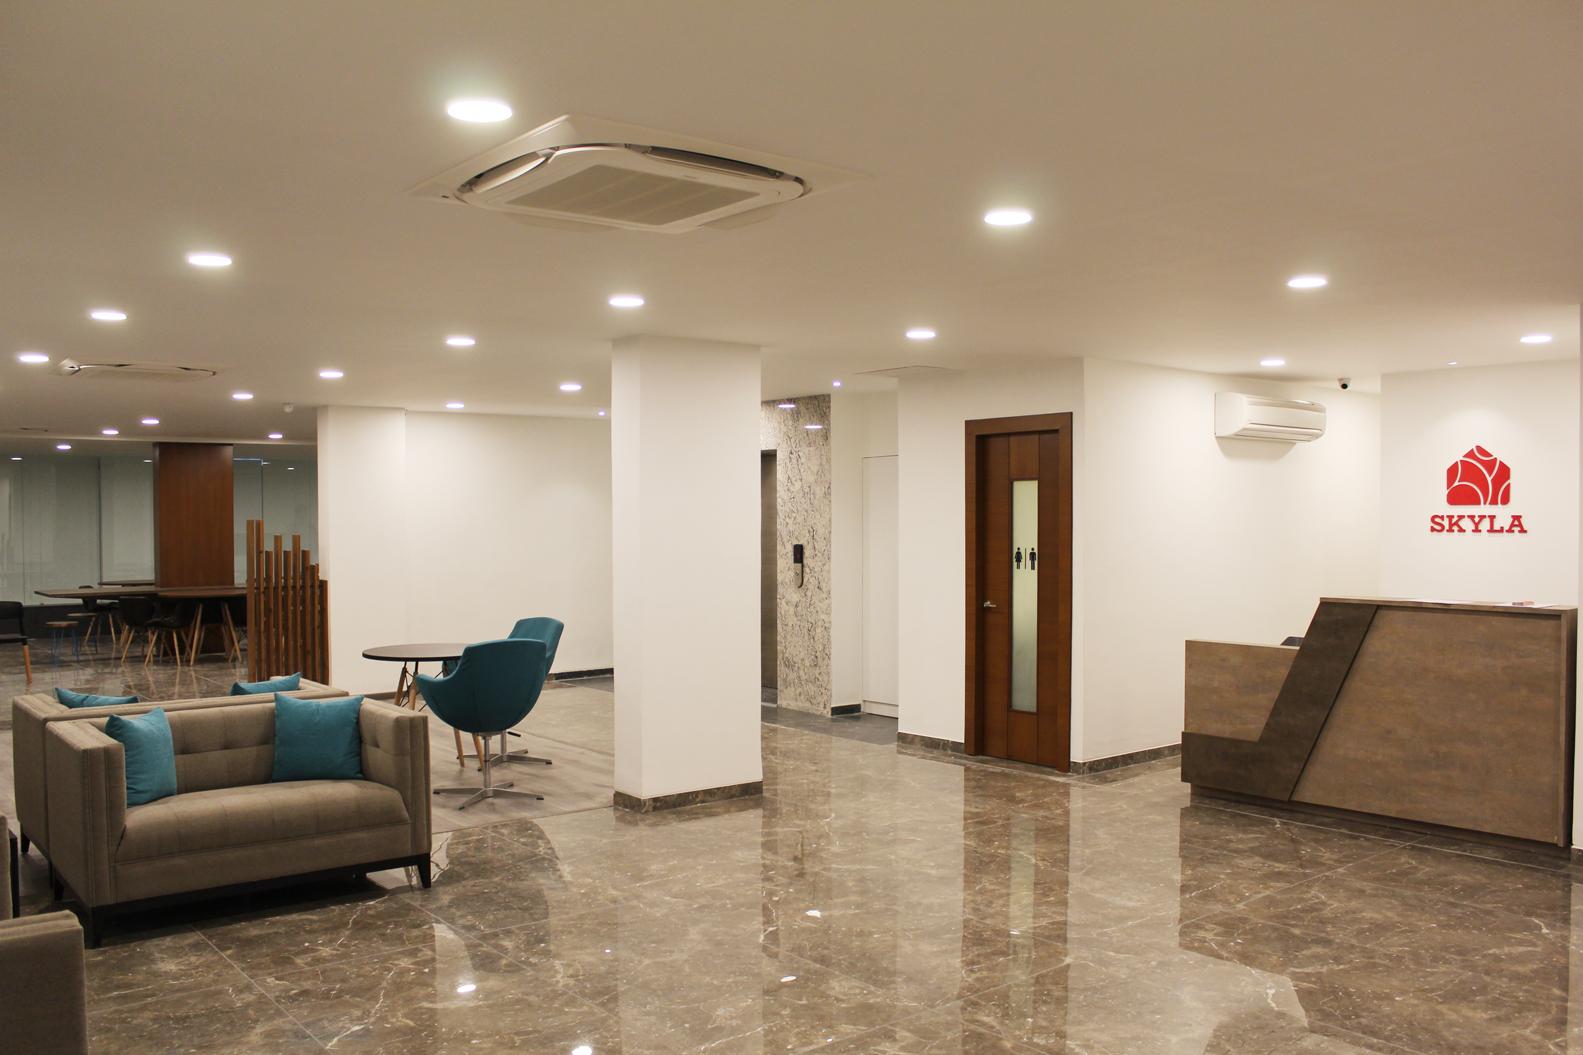 skyla-service-suits-hyderabad-jubilee-hills-studio-kitchenette-balcony5.jpg